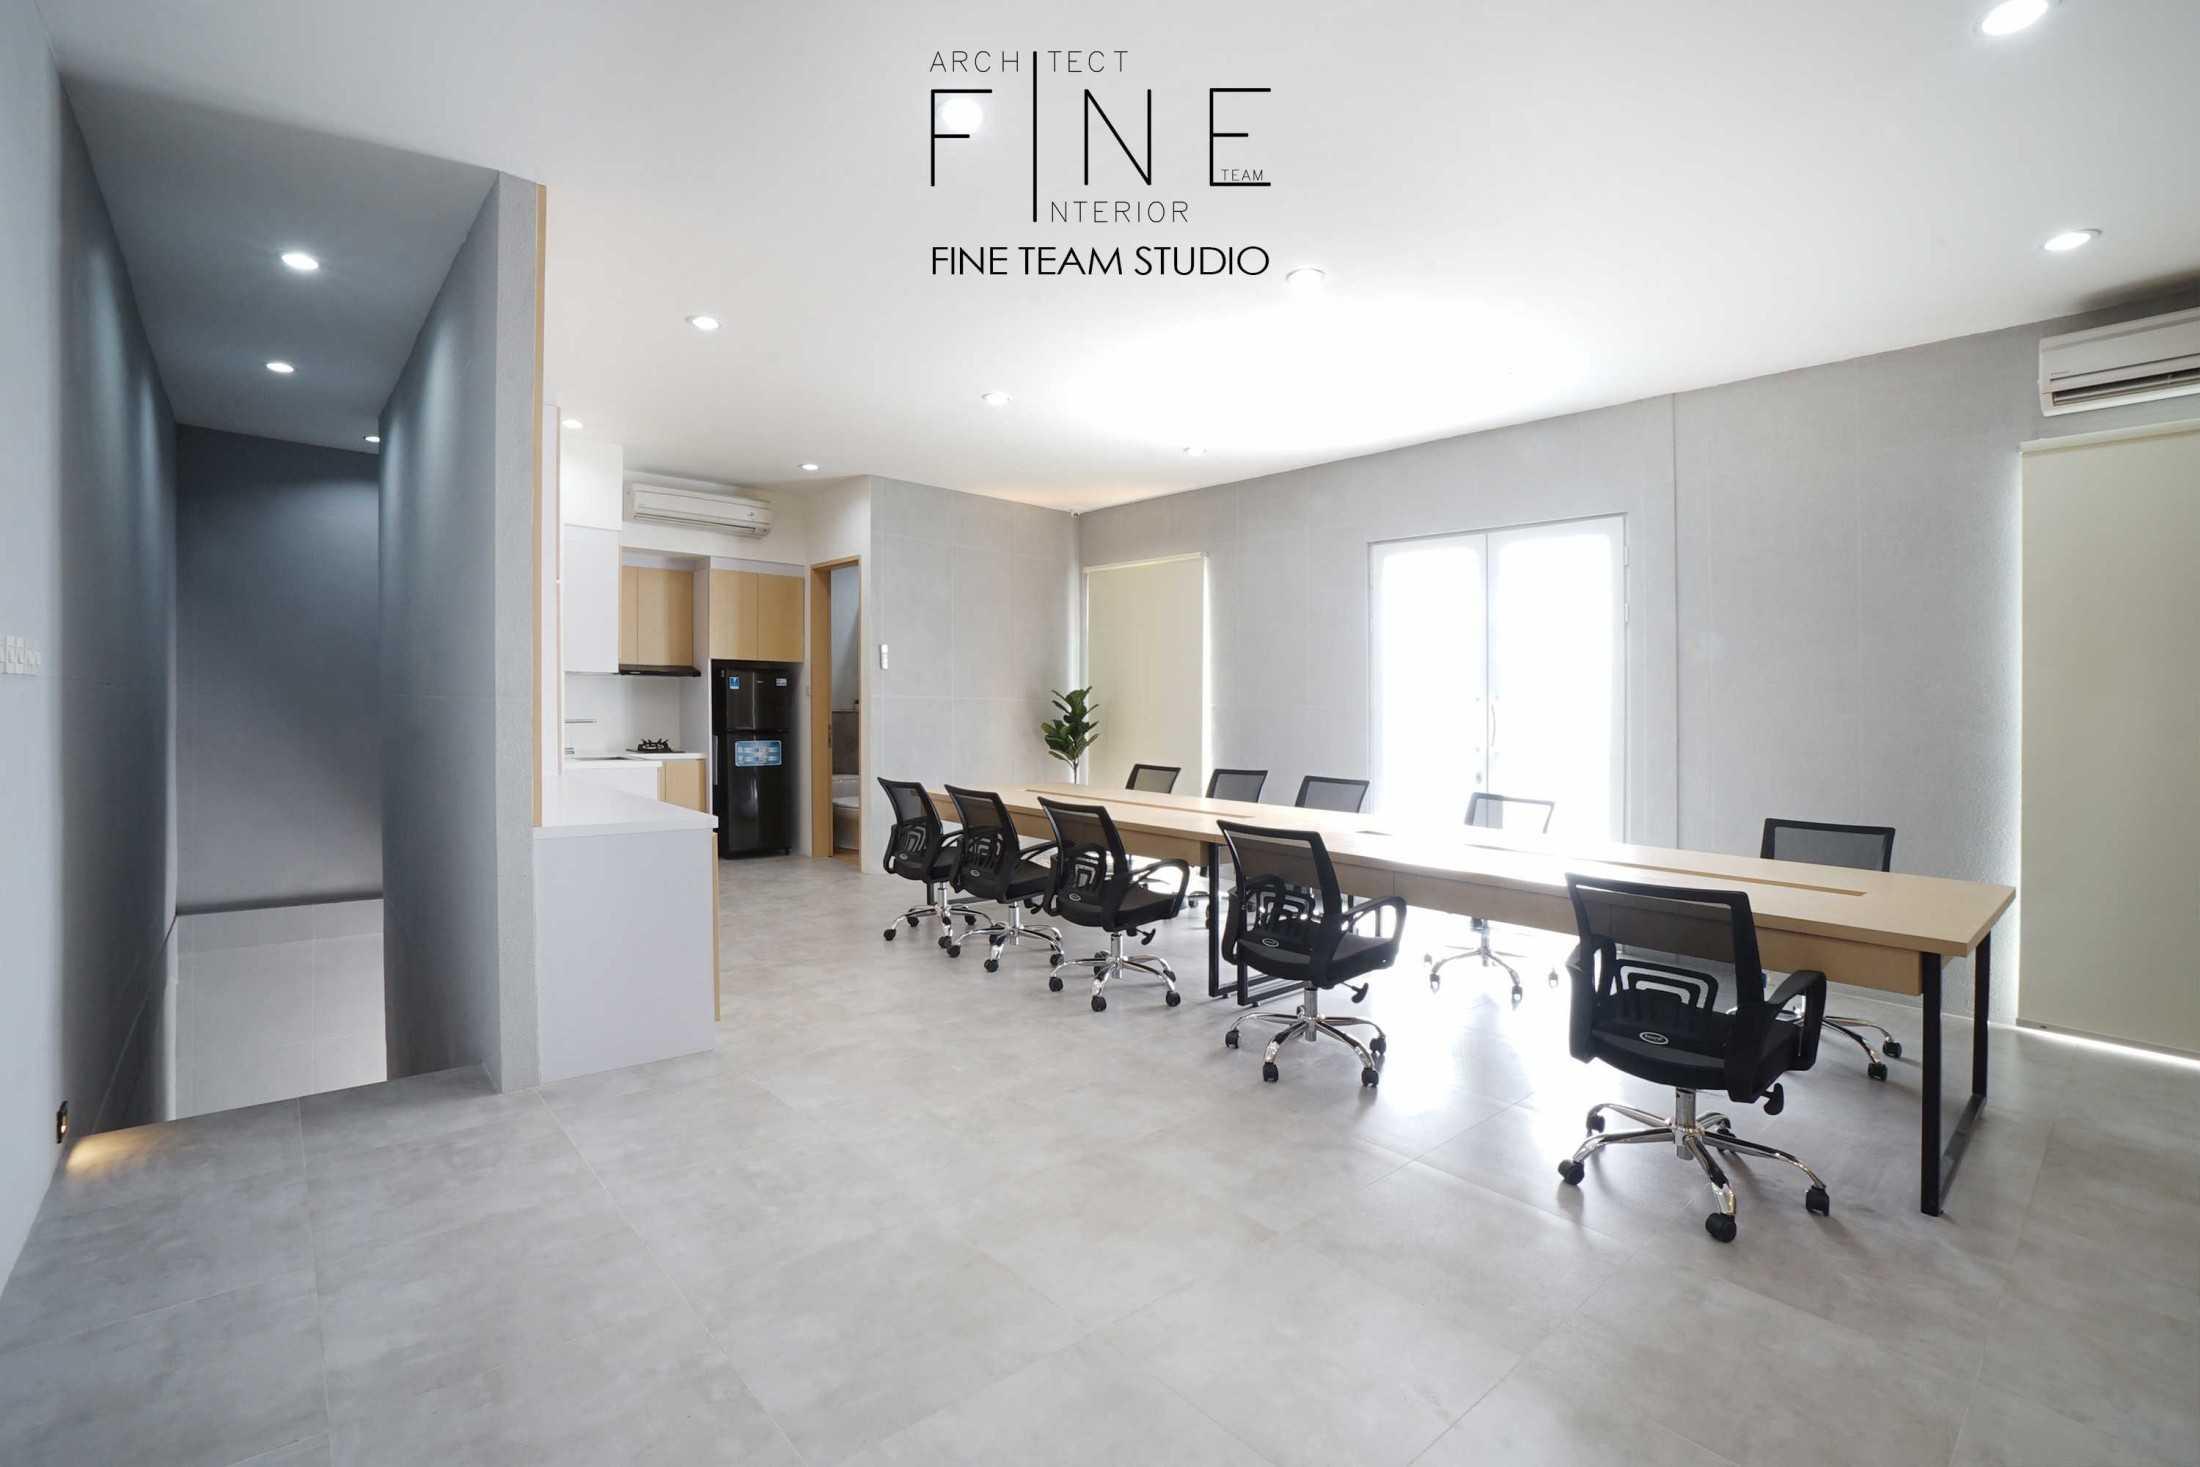 Fine Team Studio Mob Office Cikupa, Tangerang, Banten, Indonesia Cikupa, Tangerang, Banten, Indonesia Fine-Team-Studio-Mob-Office  71136